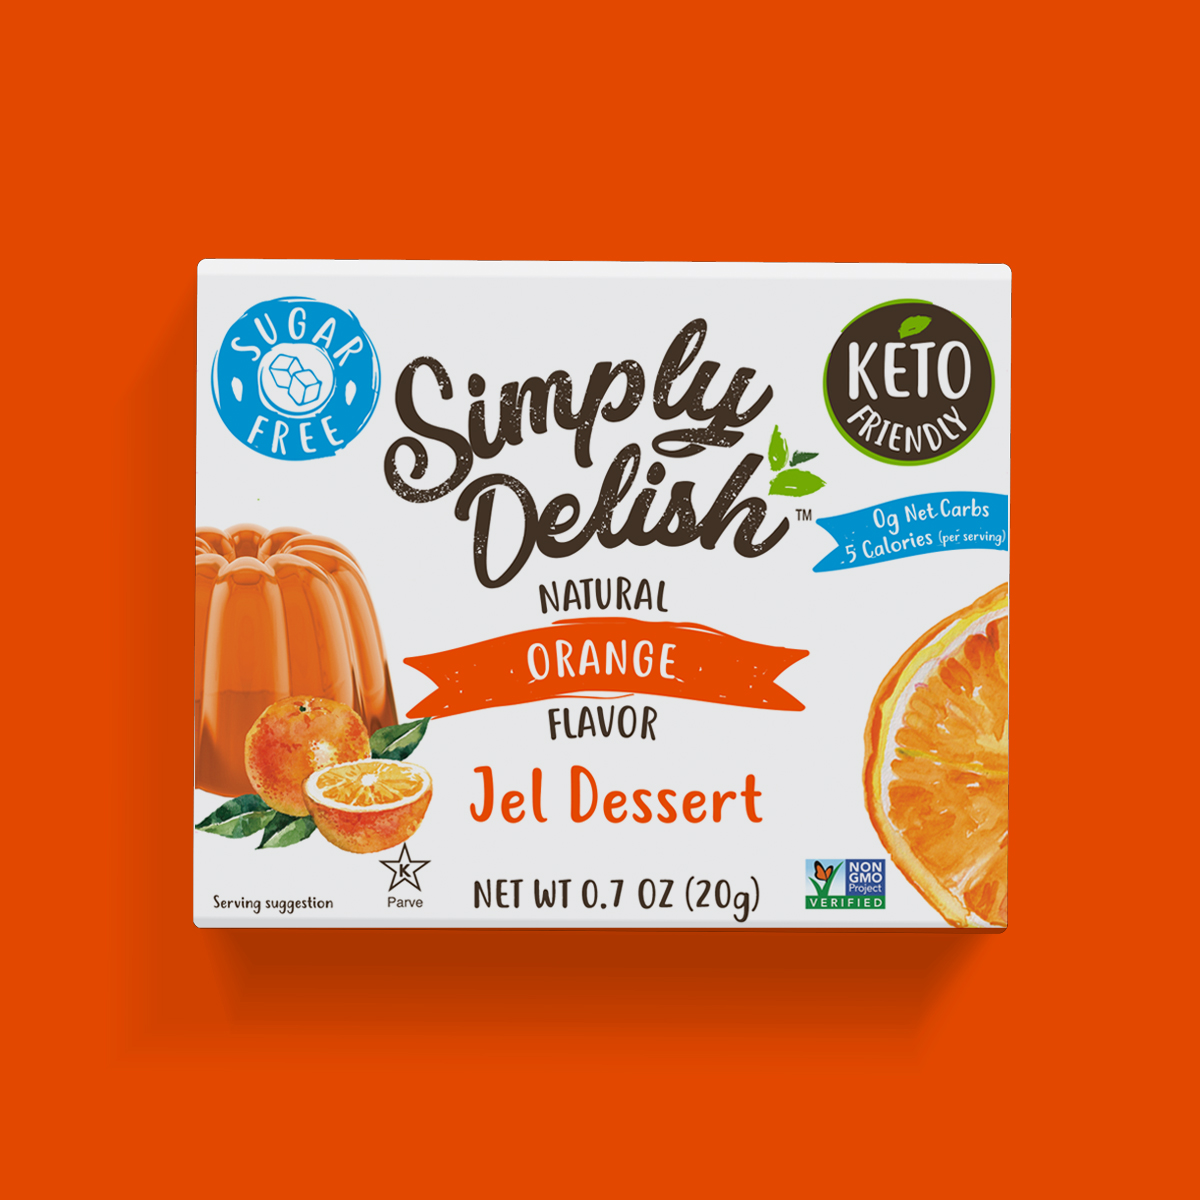 Simply Delish Keto Friendly Orange Jel